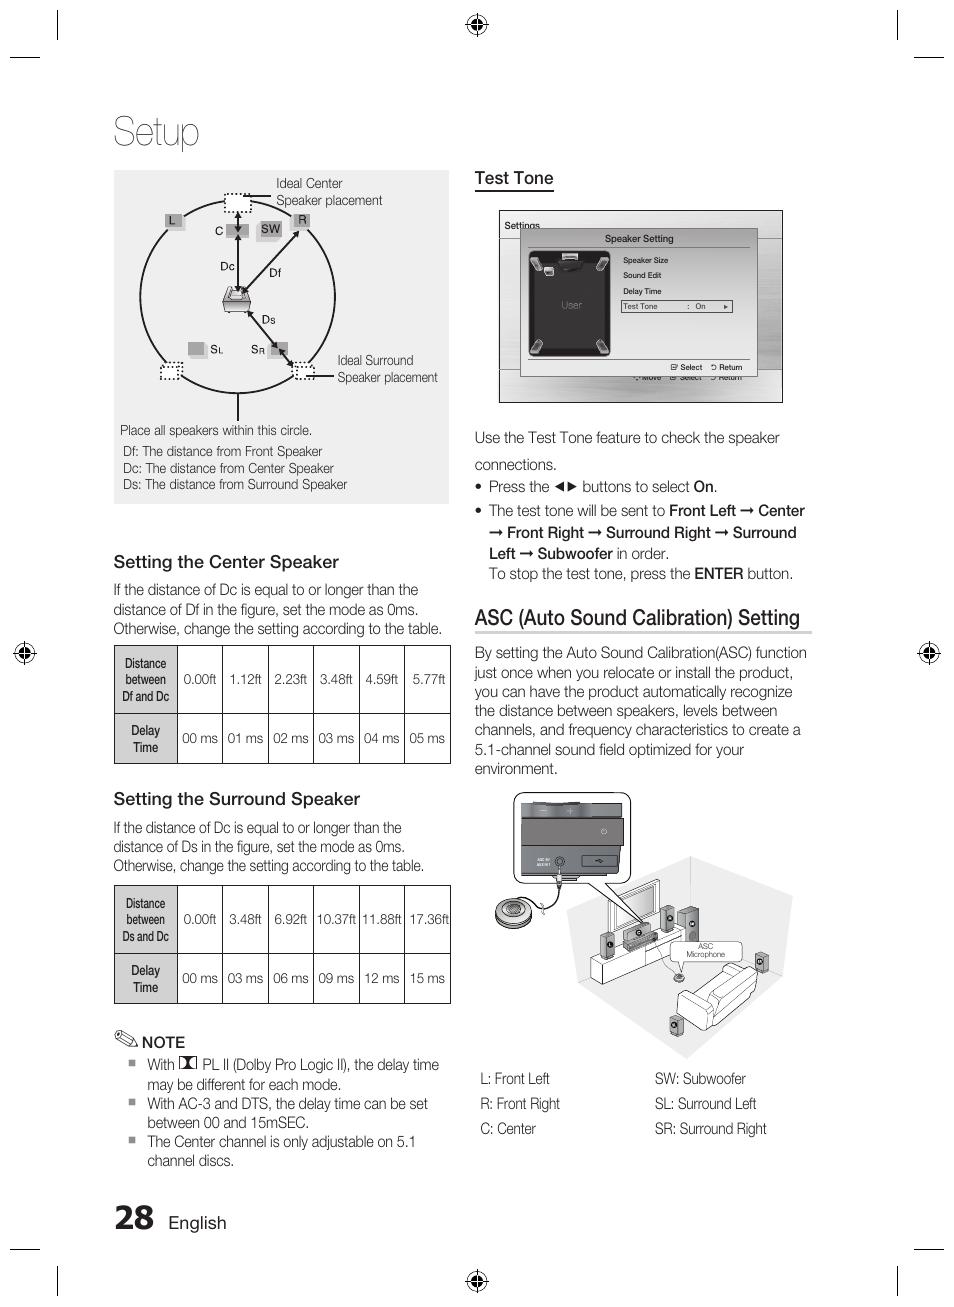 Setup, Asc (auto sound calibration) setting | Samsung AH68-02333R User  Manual